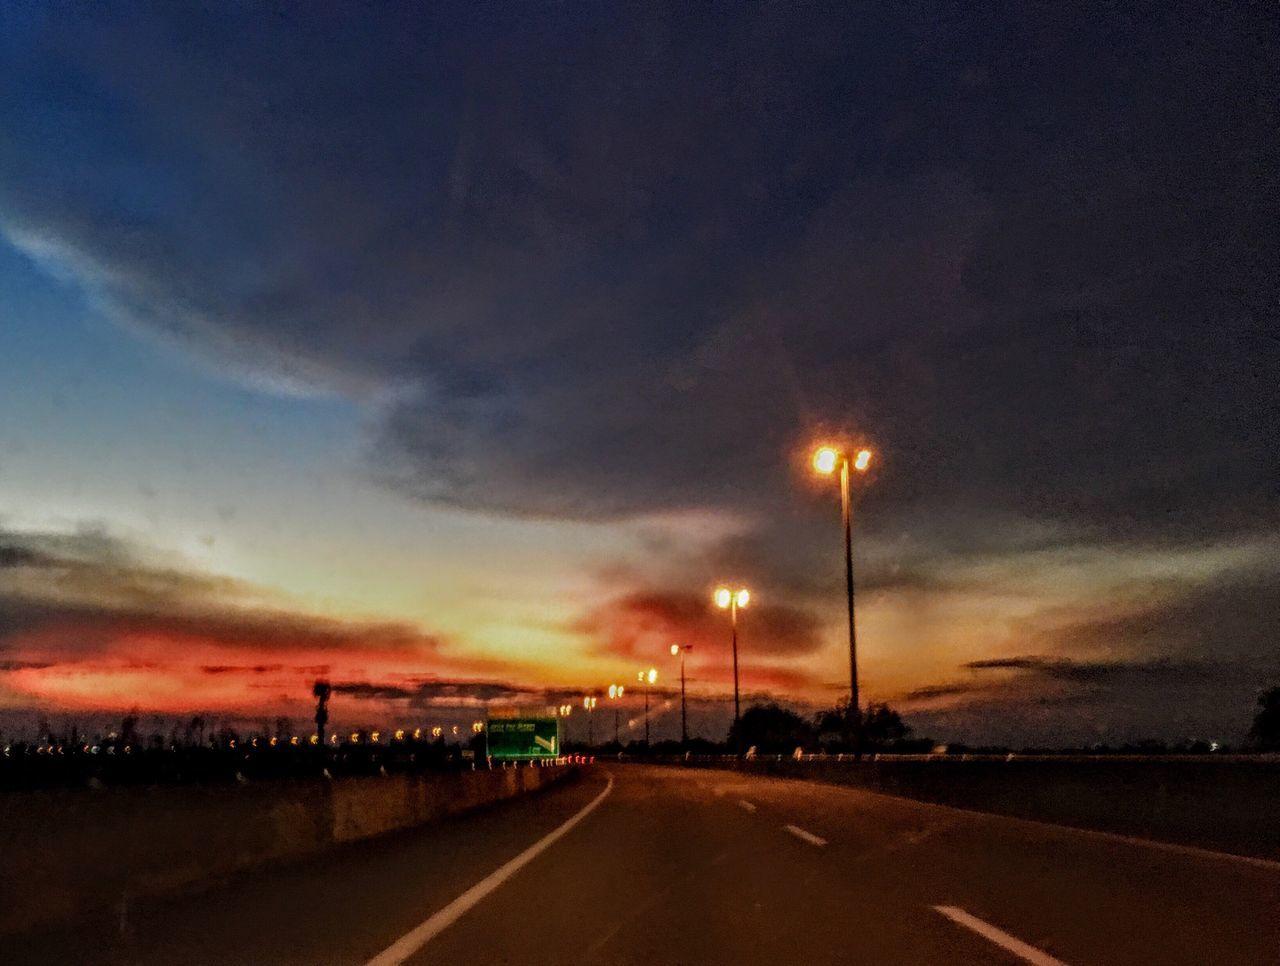 road, the way forward, sky, illuminated, transportation, cloud - sky, street light, sunset, night, outdoors, no people, building exterior, nature, architecture